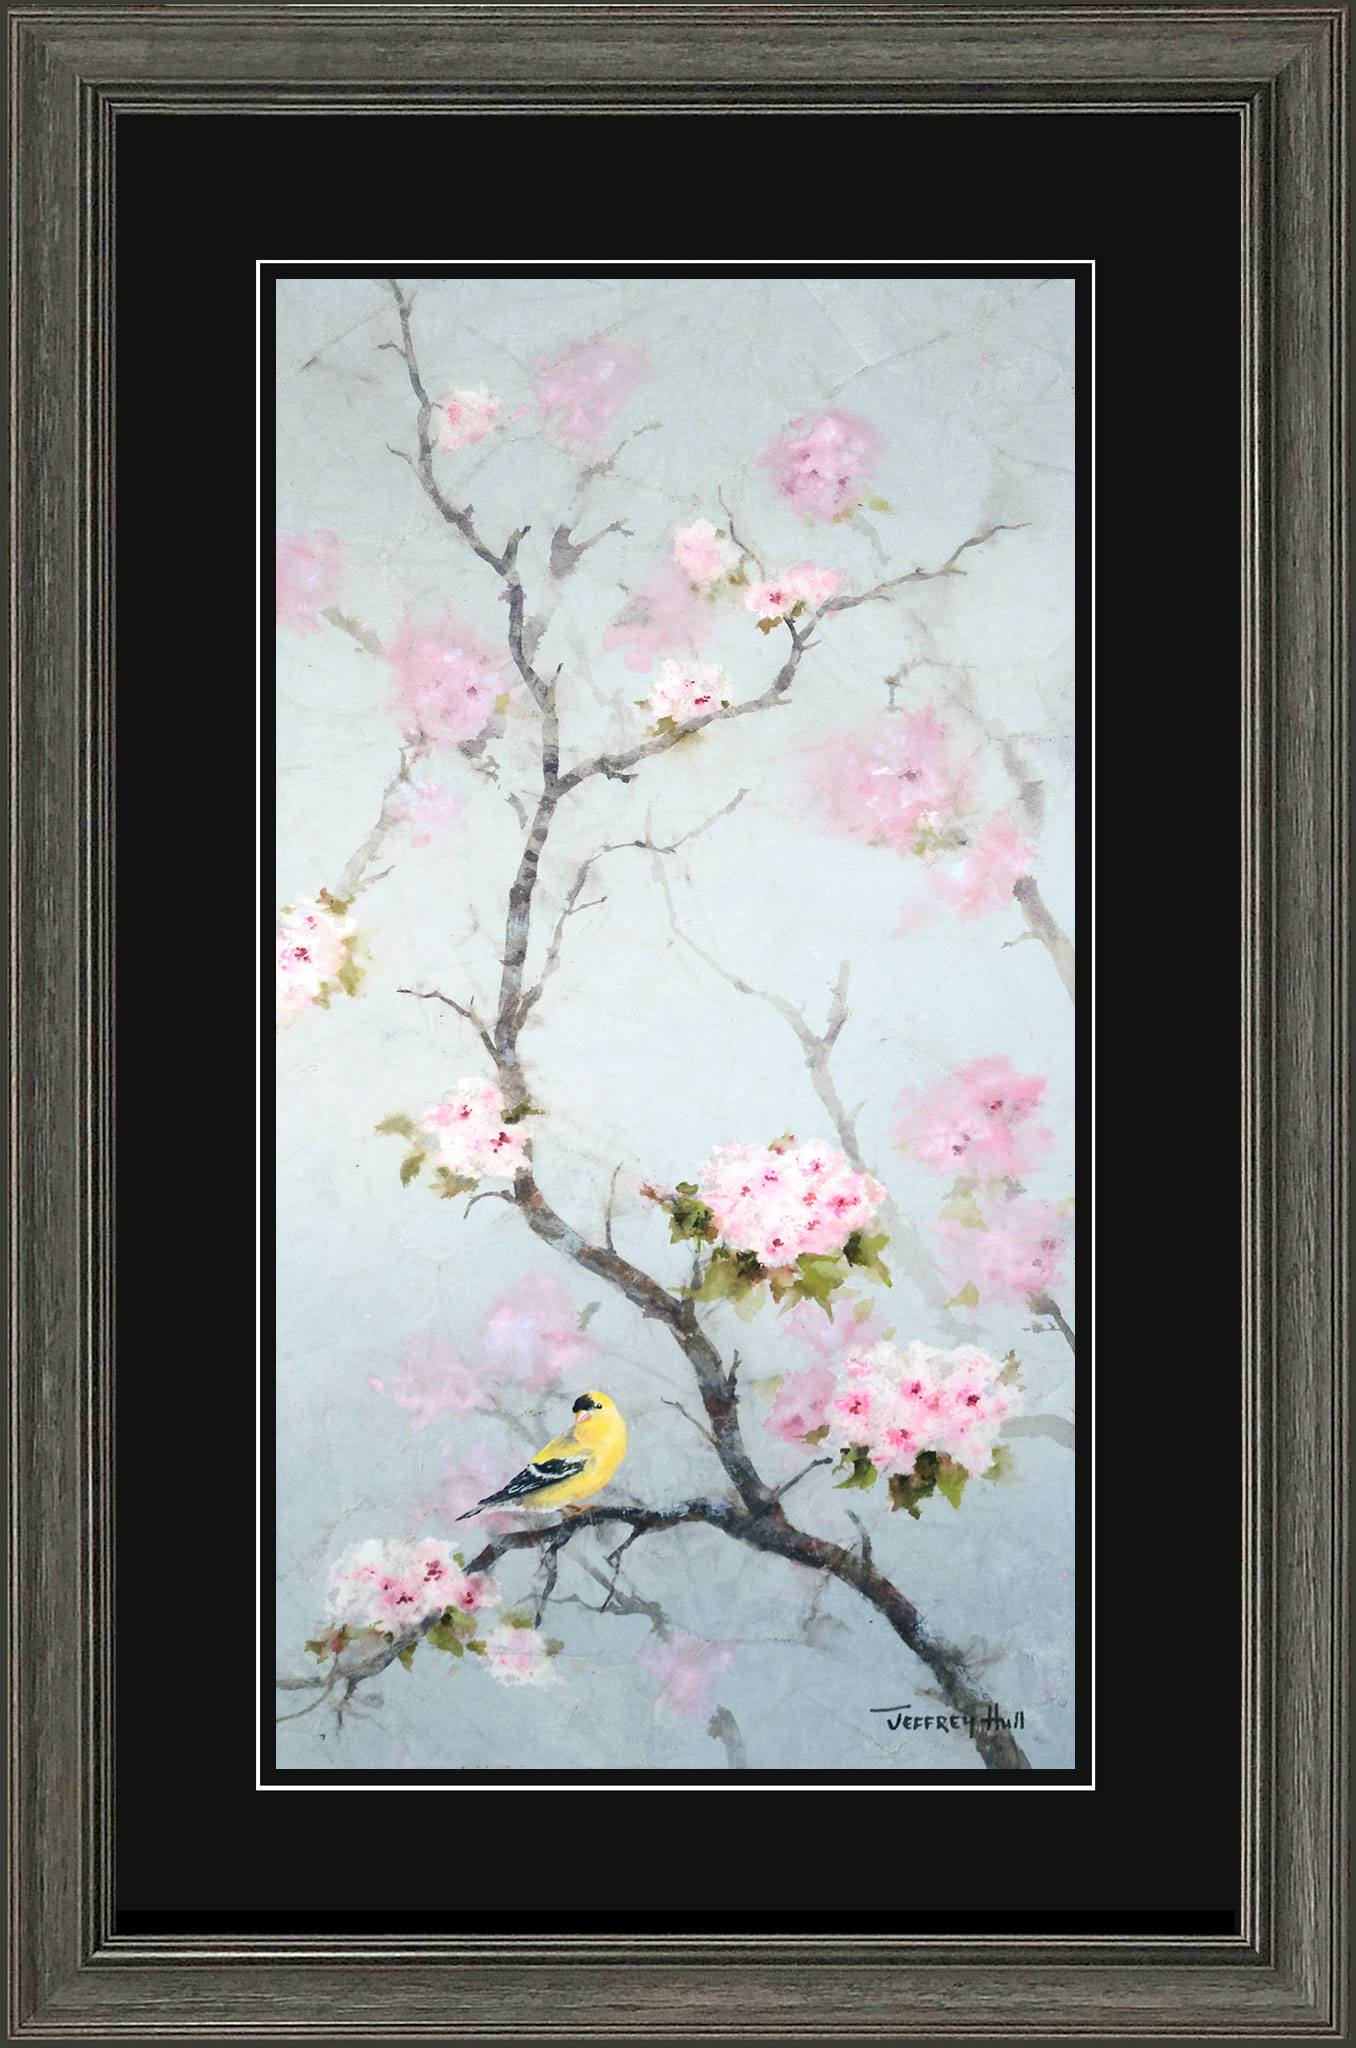 Goldfinch-_-Cherry-Blossoms-LimEd-Cascade-Jet-Black-4-Website-2021